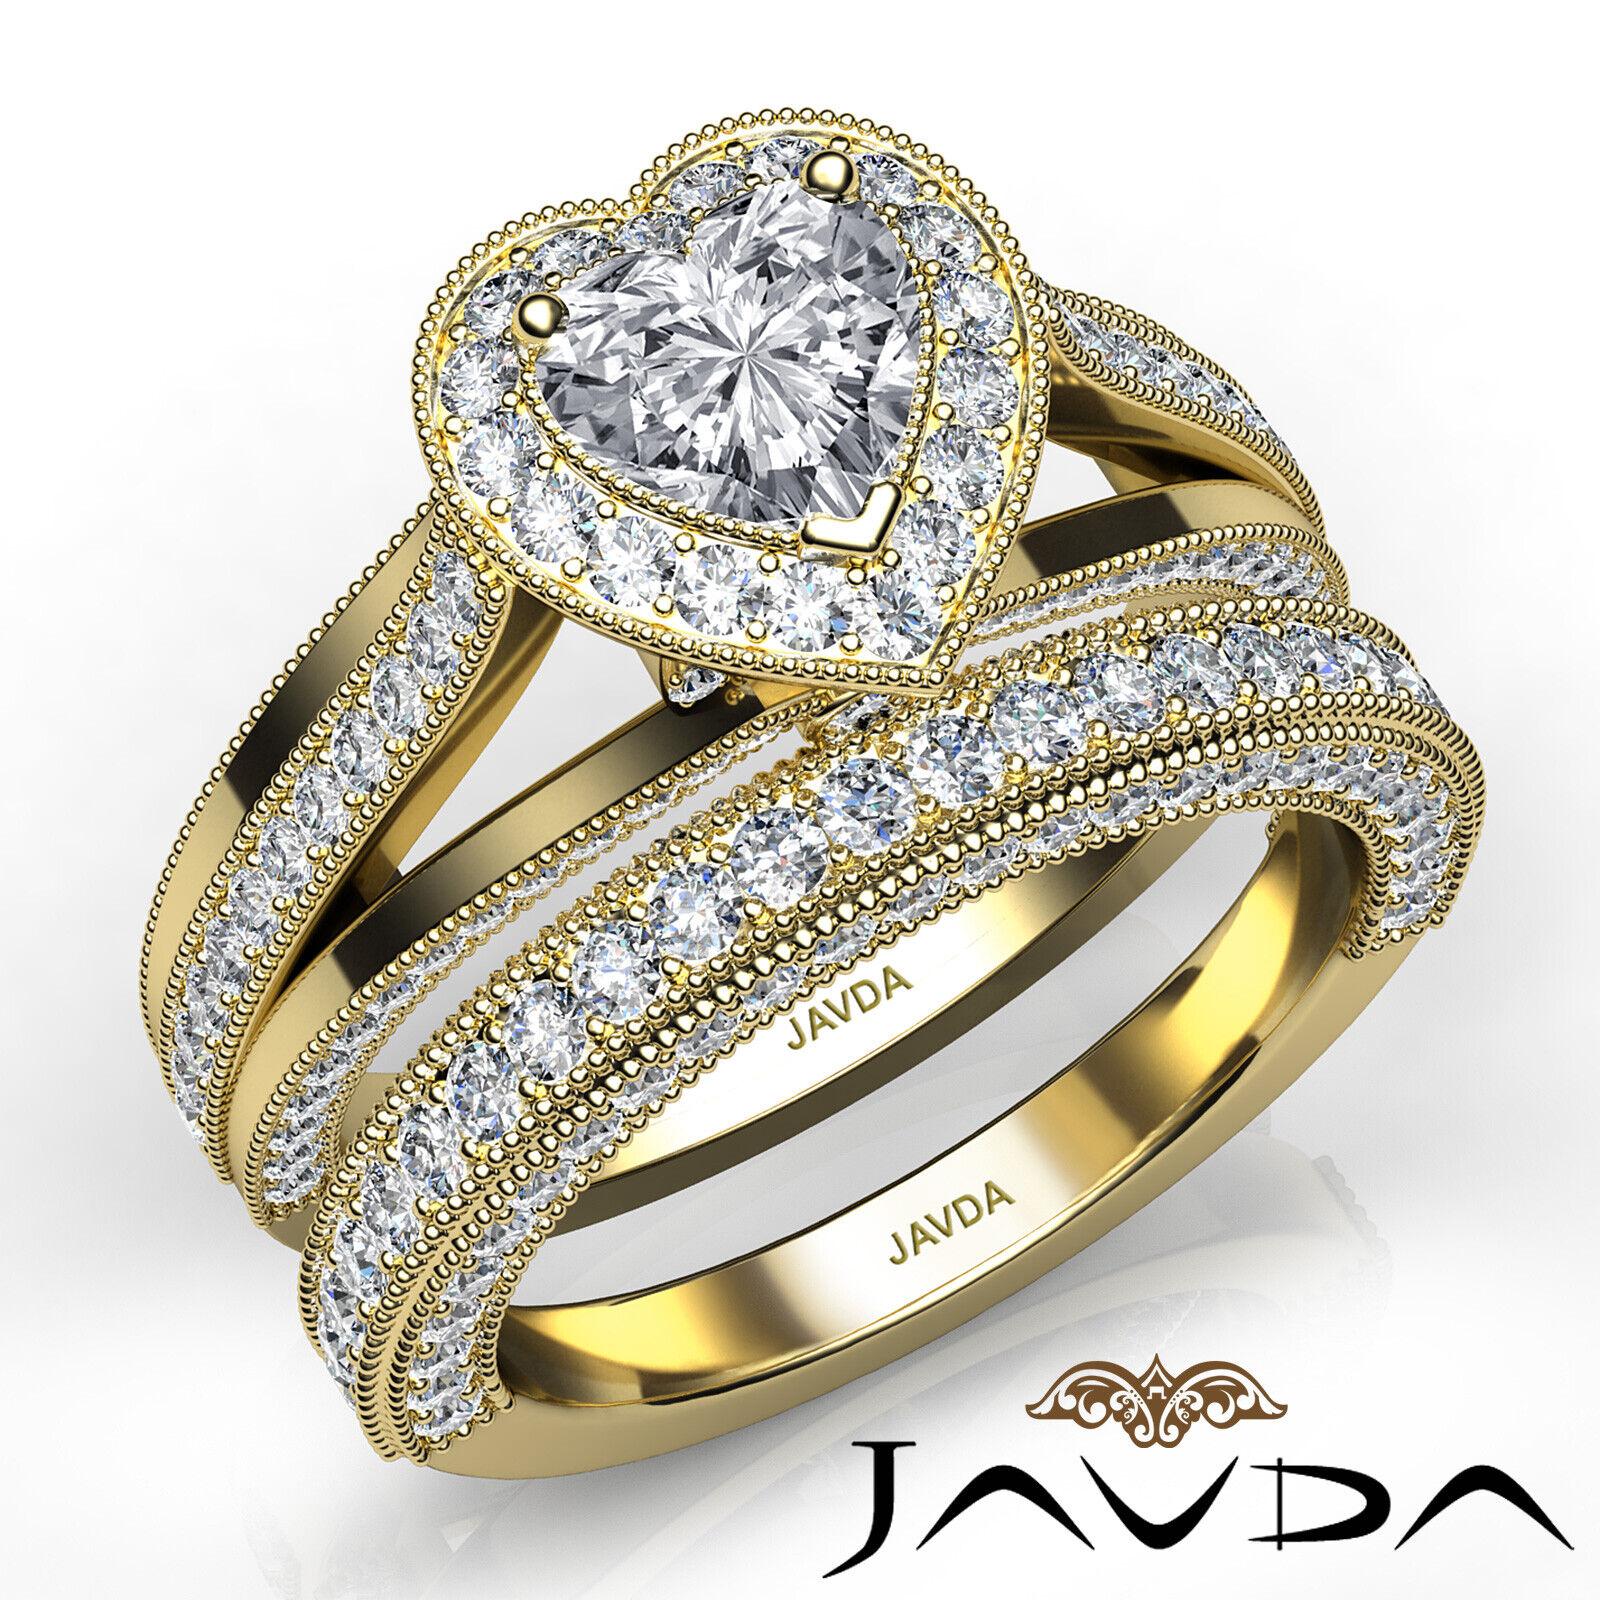 2.24ctw Halo Milgrain Edge Bridal Heart Diamond Engagement Ring GIA F-VS1  Gold 8